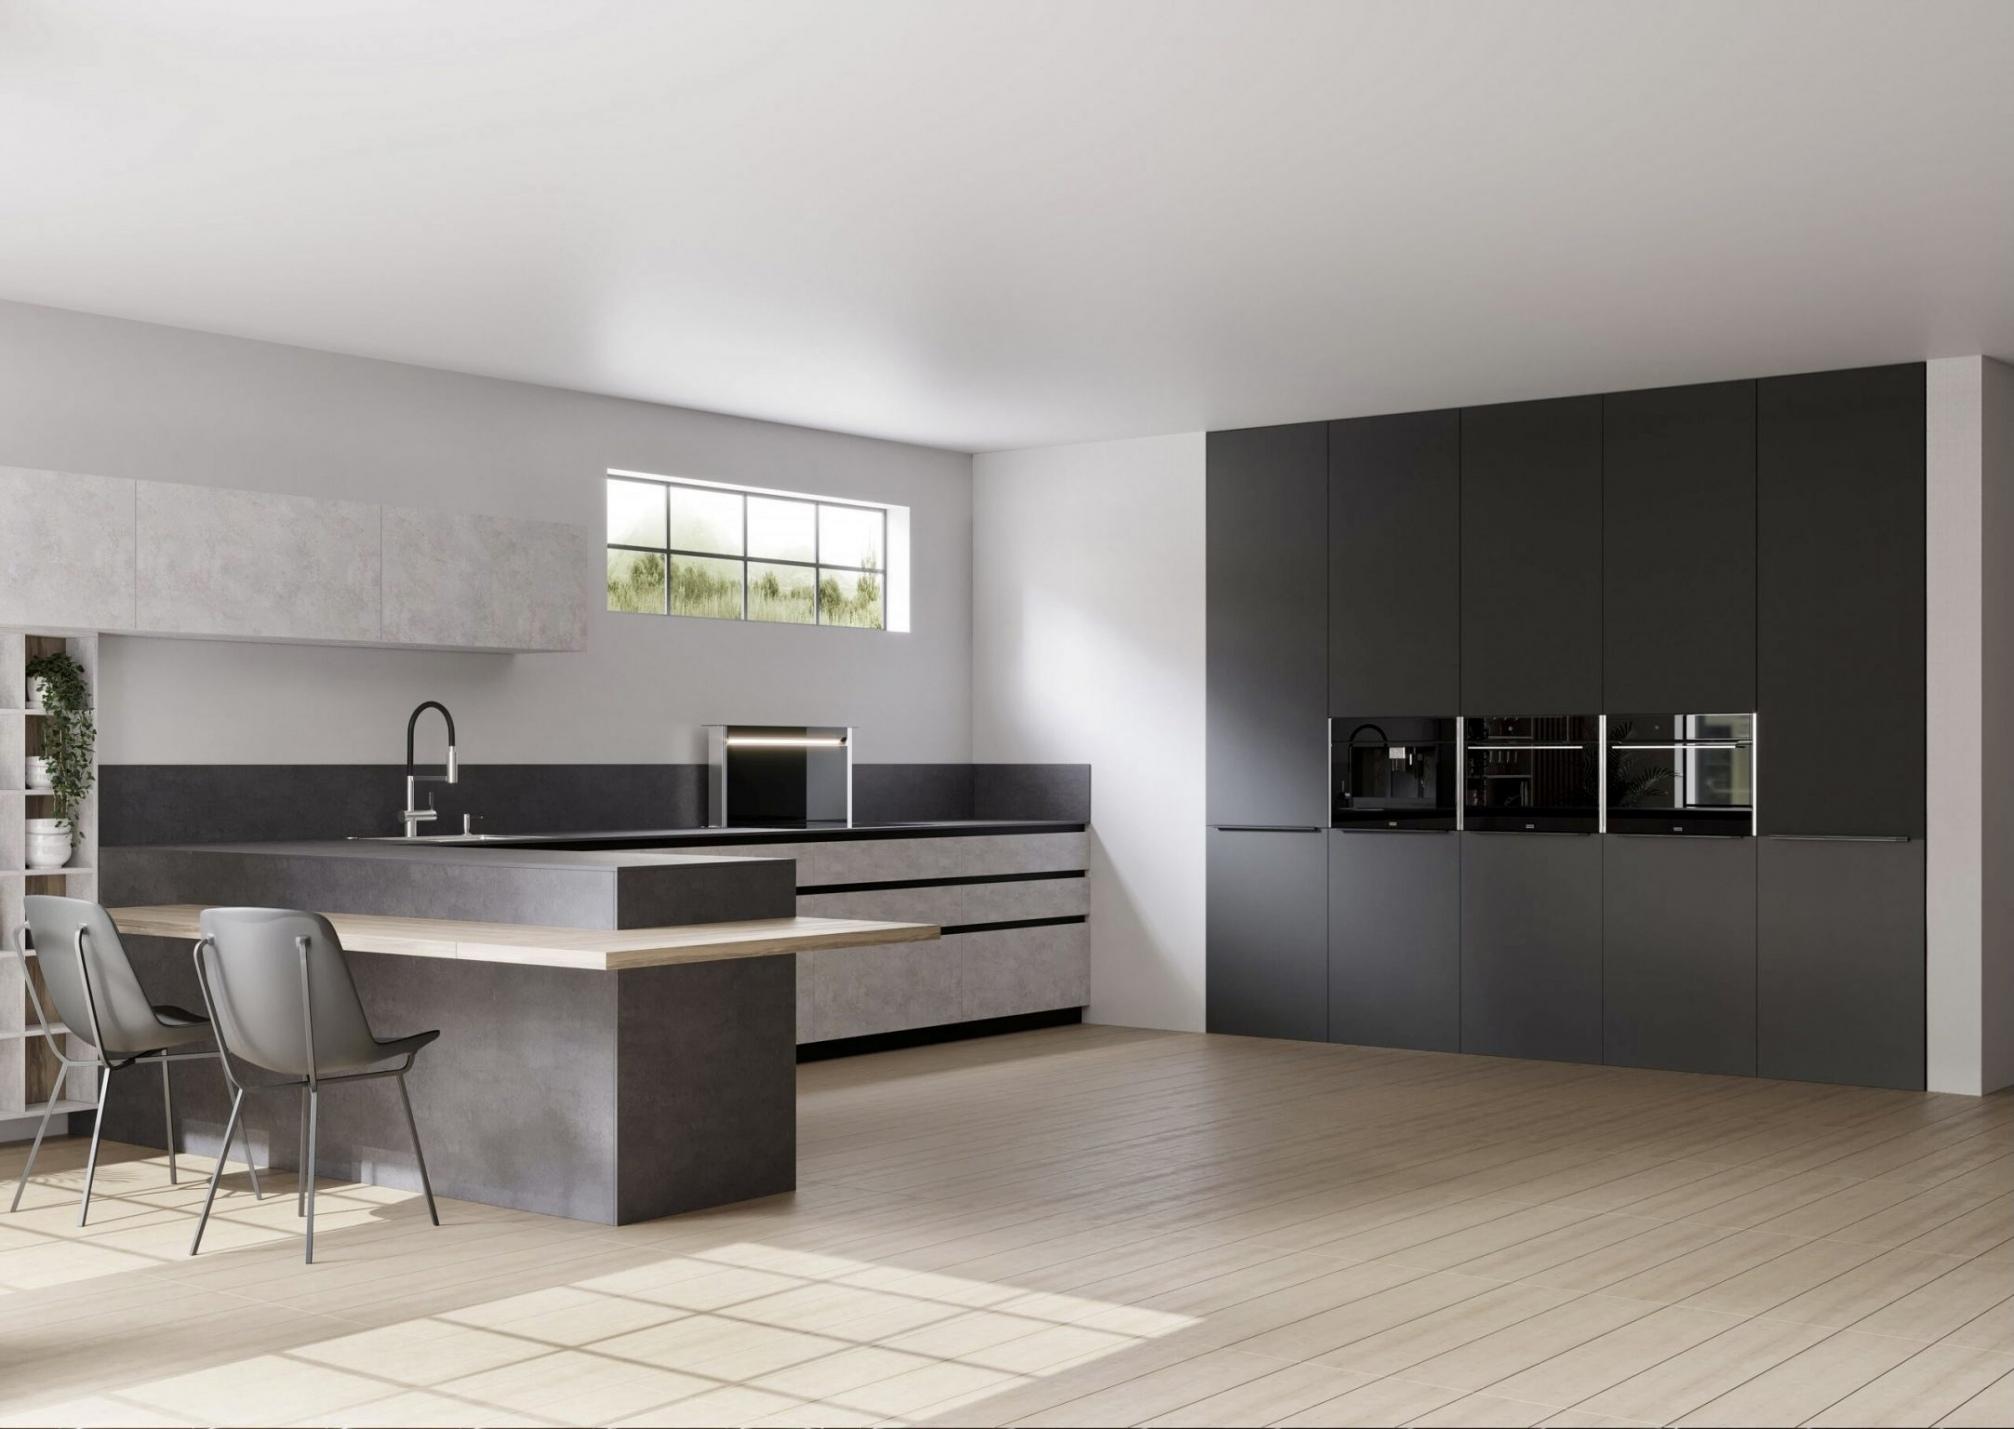 kitchen_studio_frames_6-scaled6